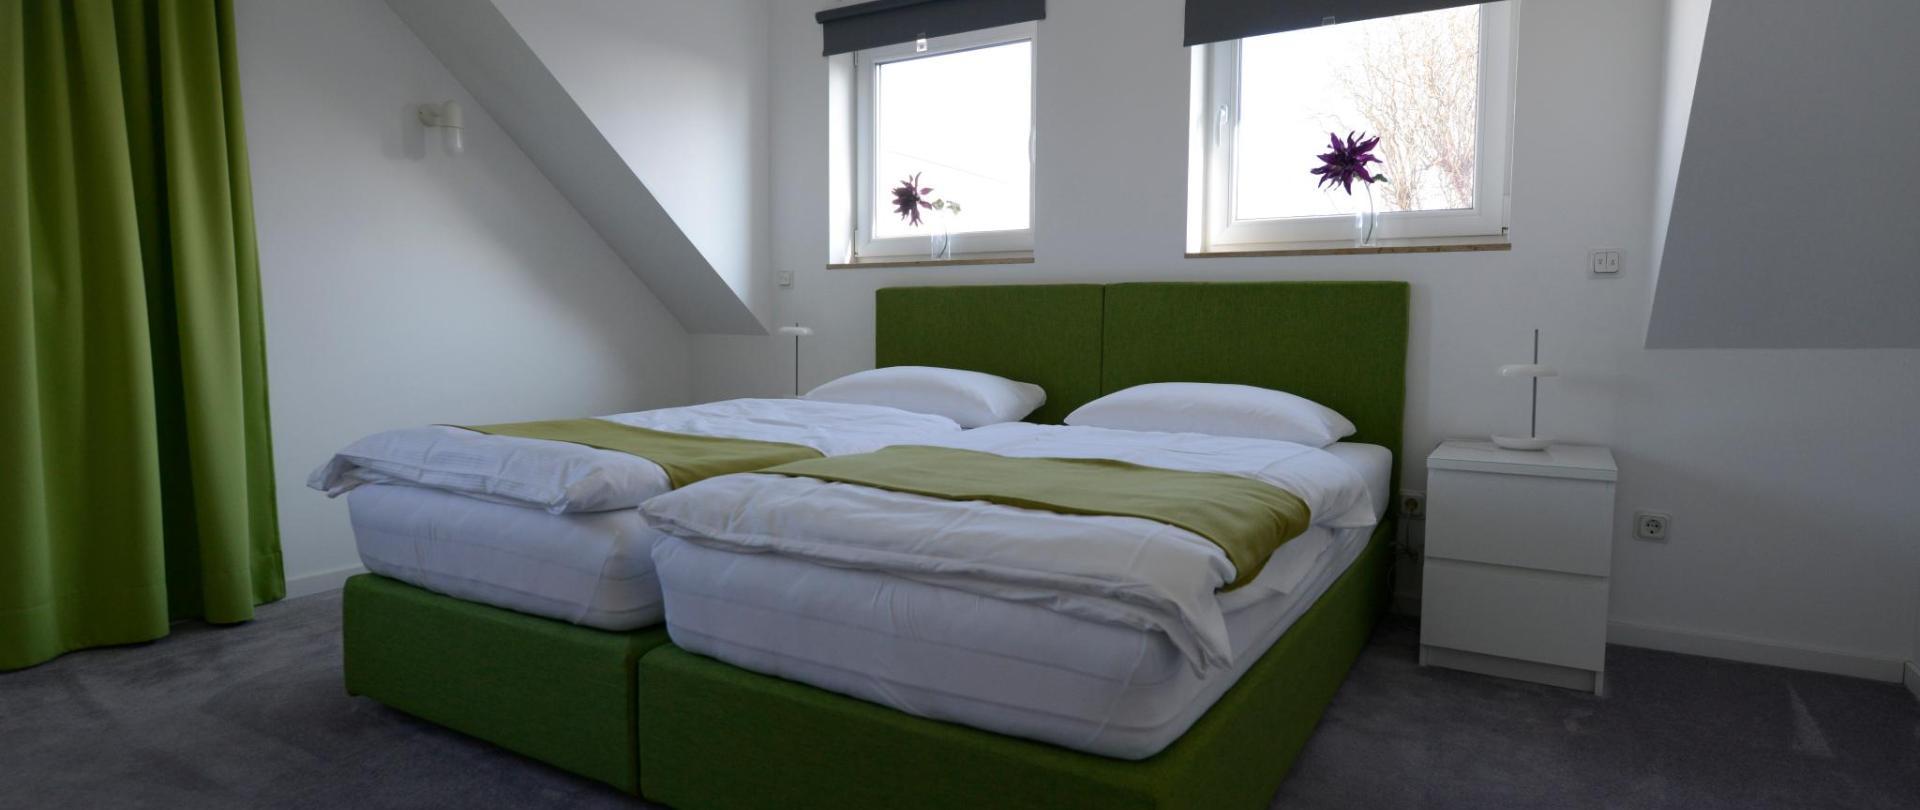 Dreamhouse - rent a room